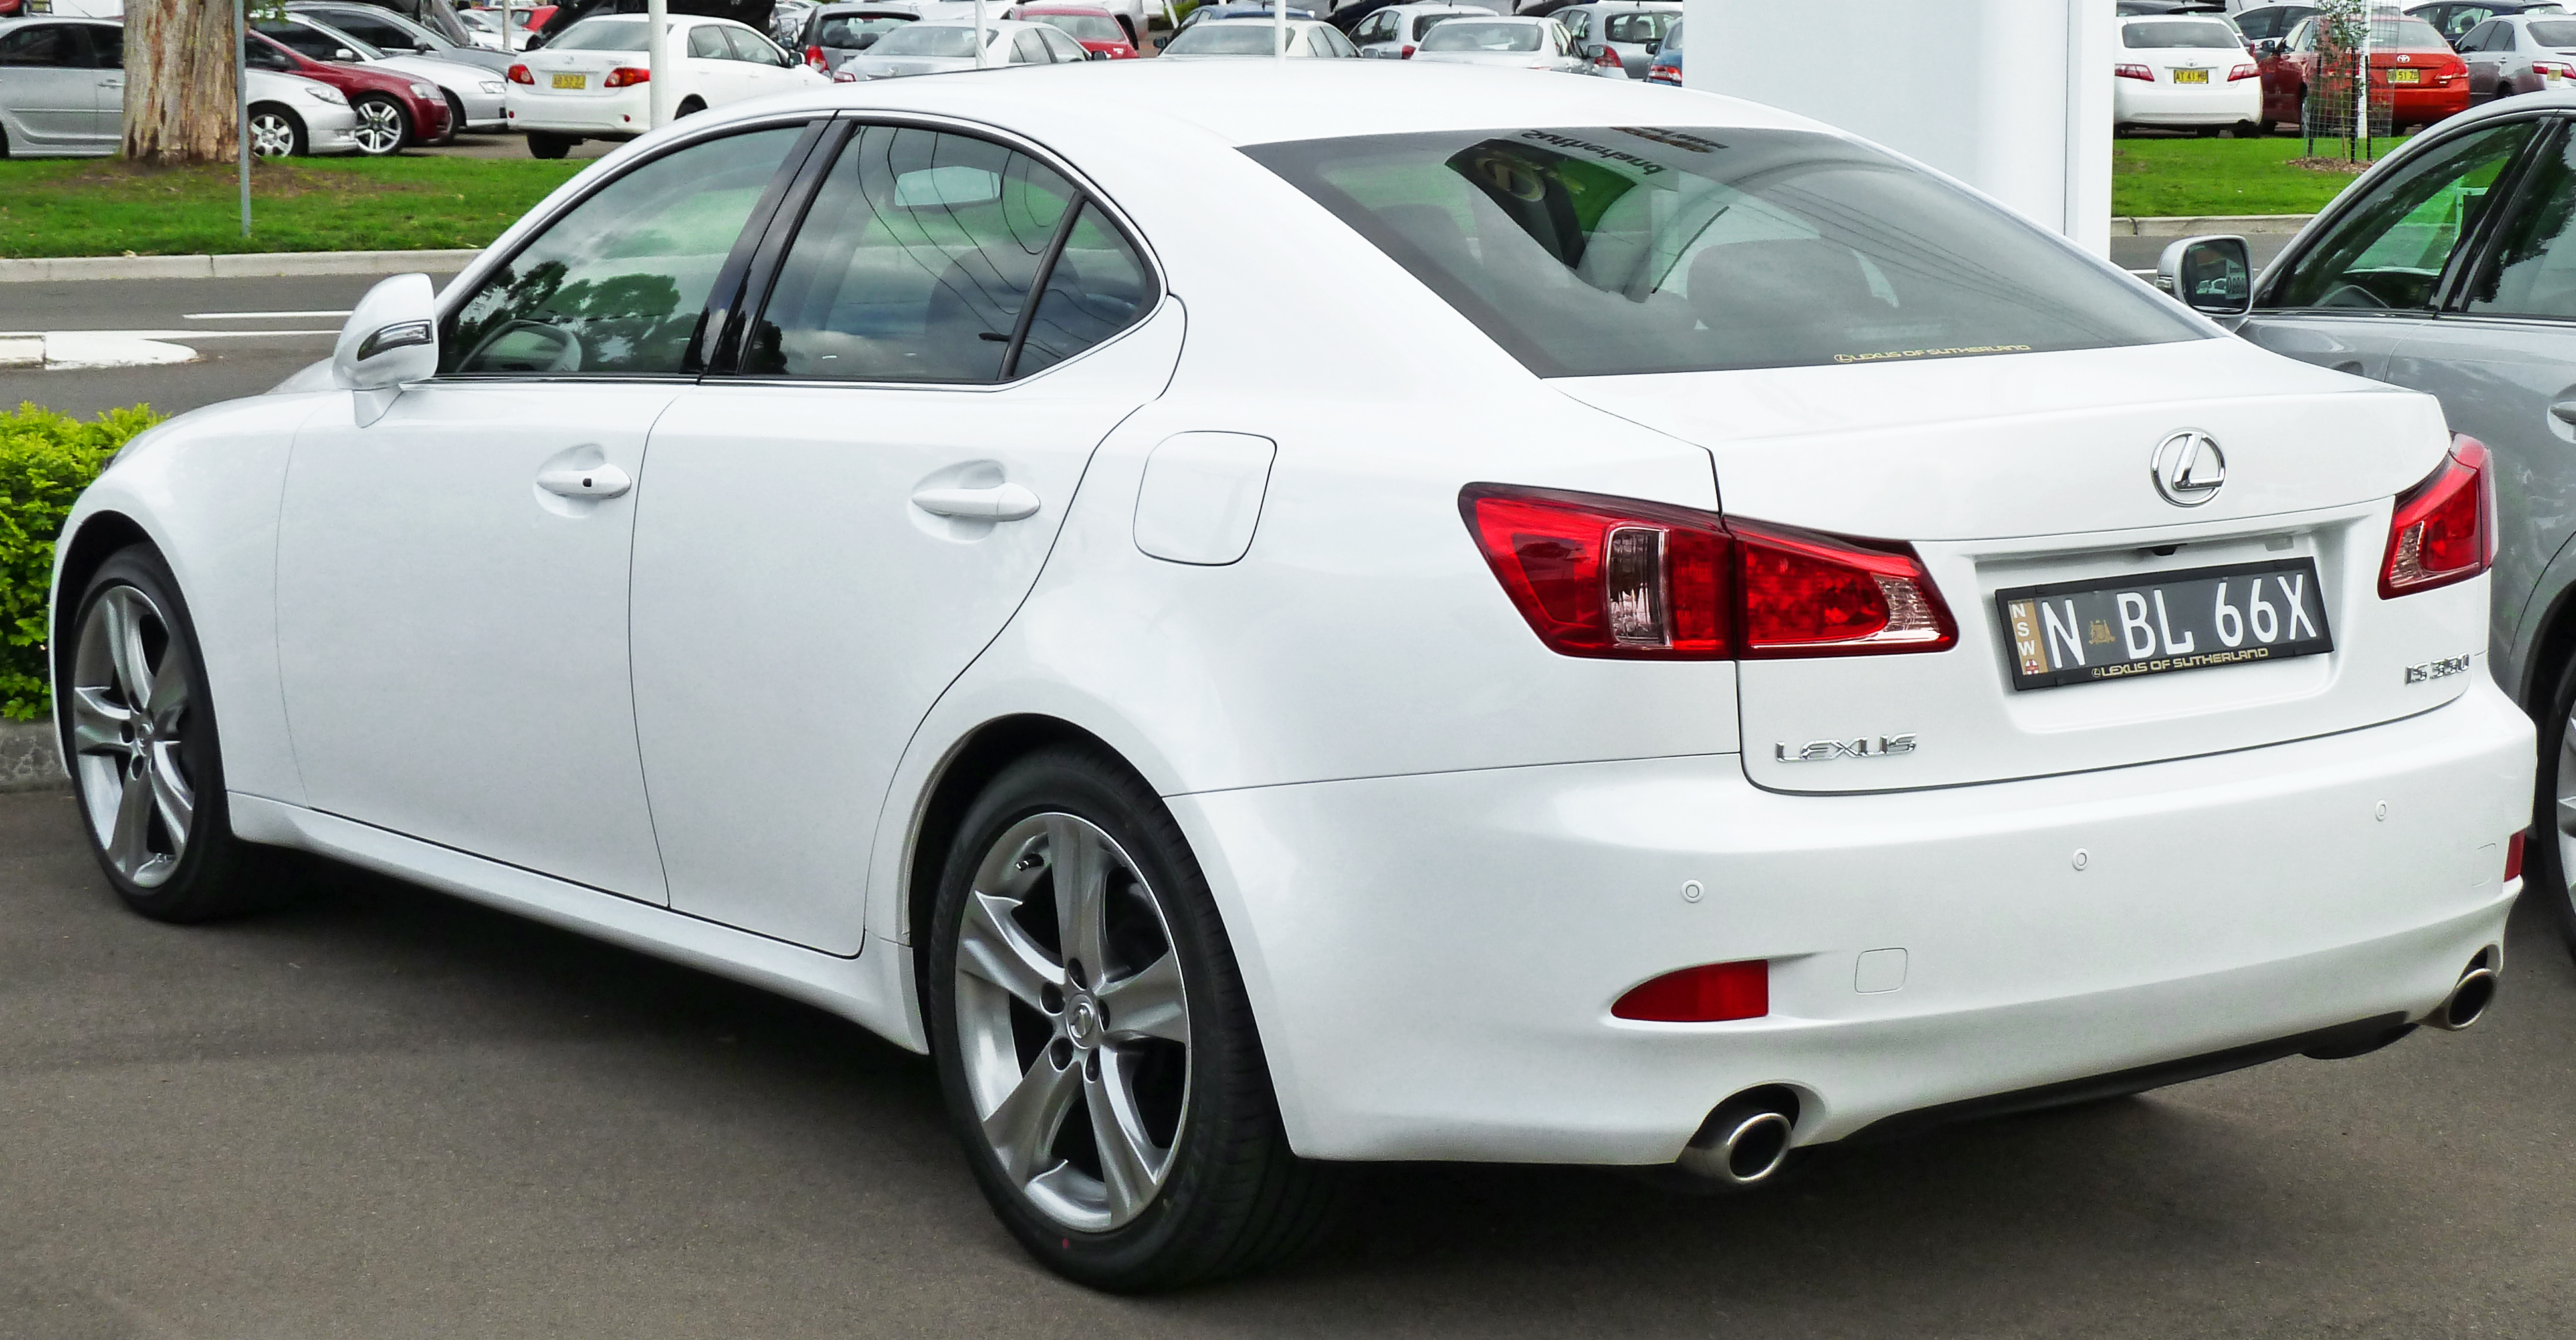 lexus united cars arab emirates sale for in jamesedition on lfa of